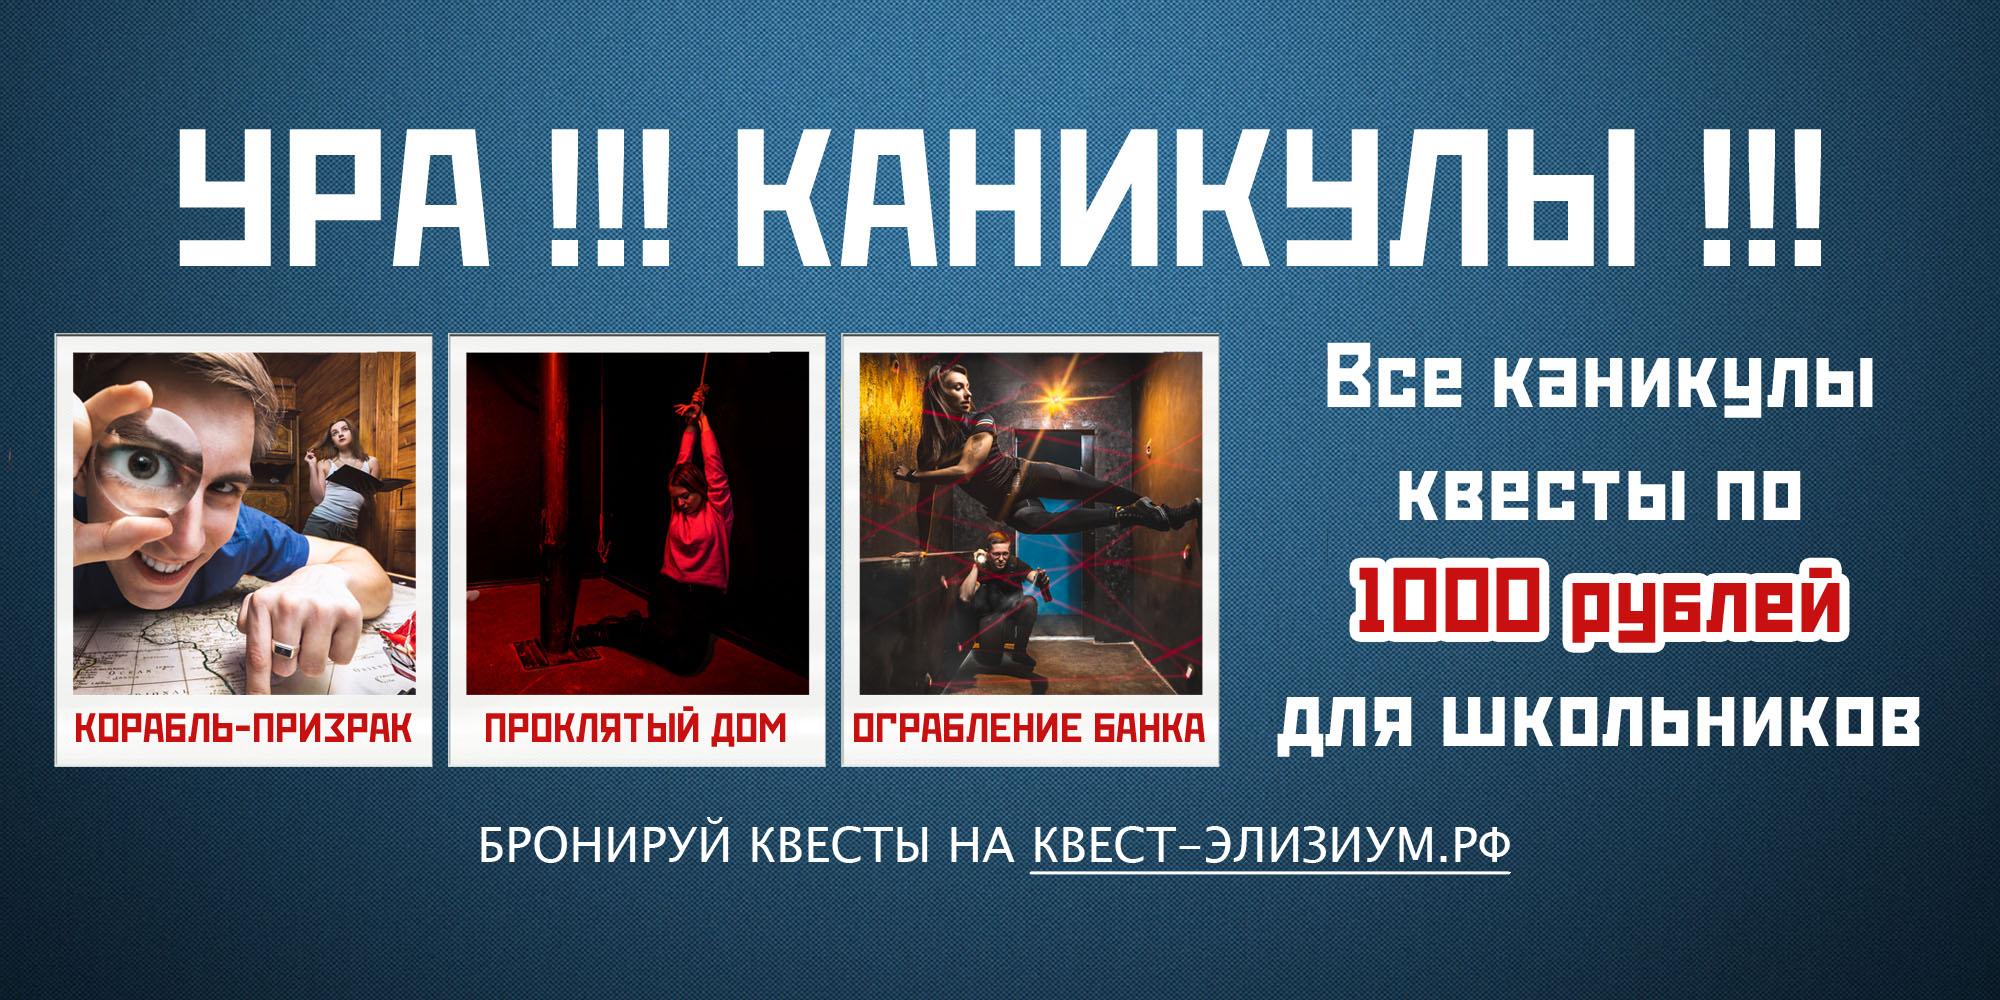 kanikuly_20001000